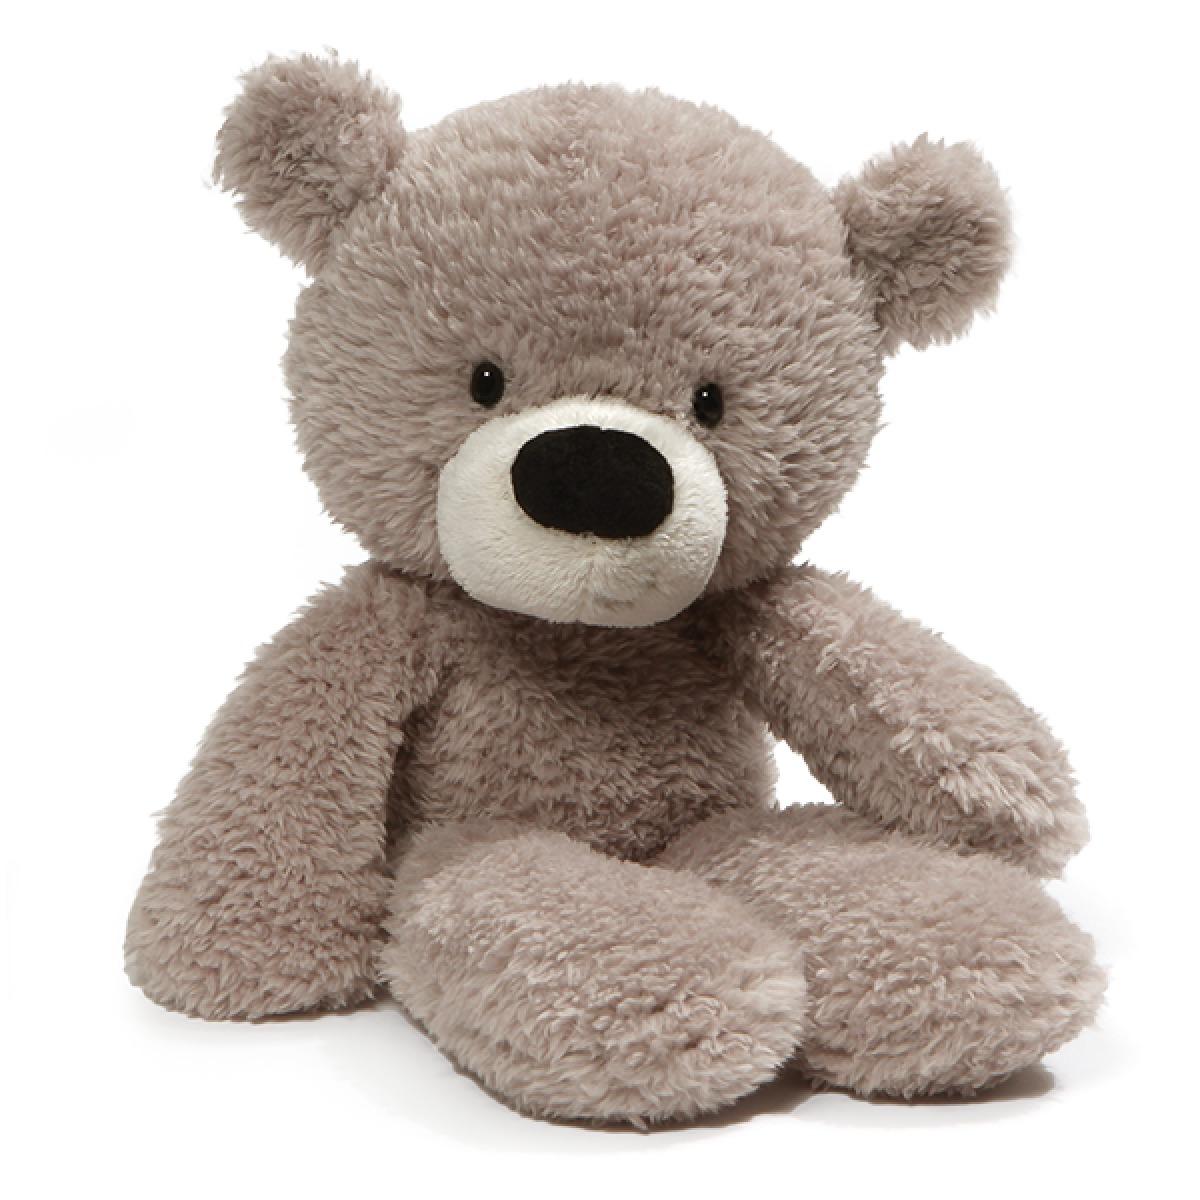 "Gund: Fuzzy Grey Bear - 13"" Plush image"